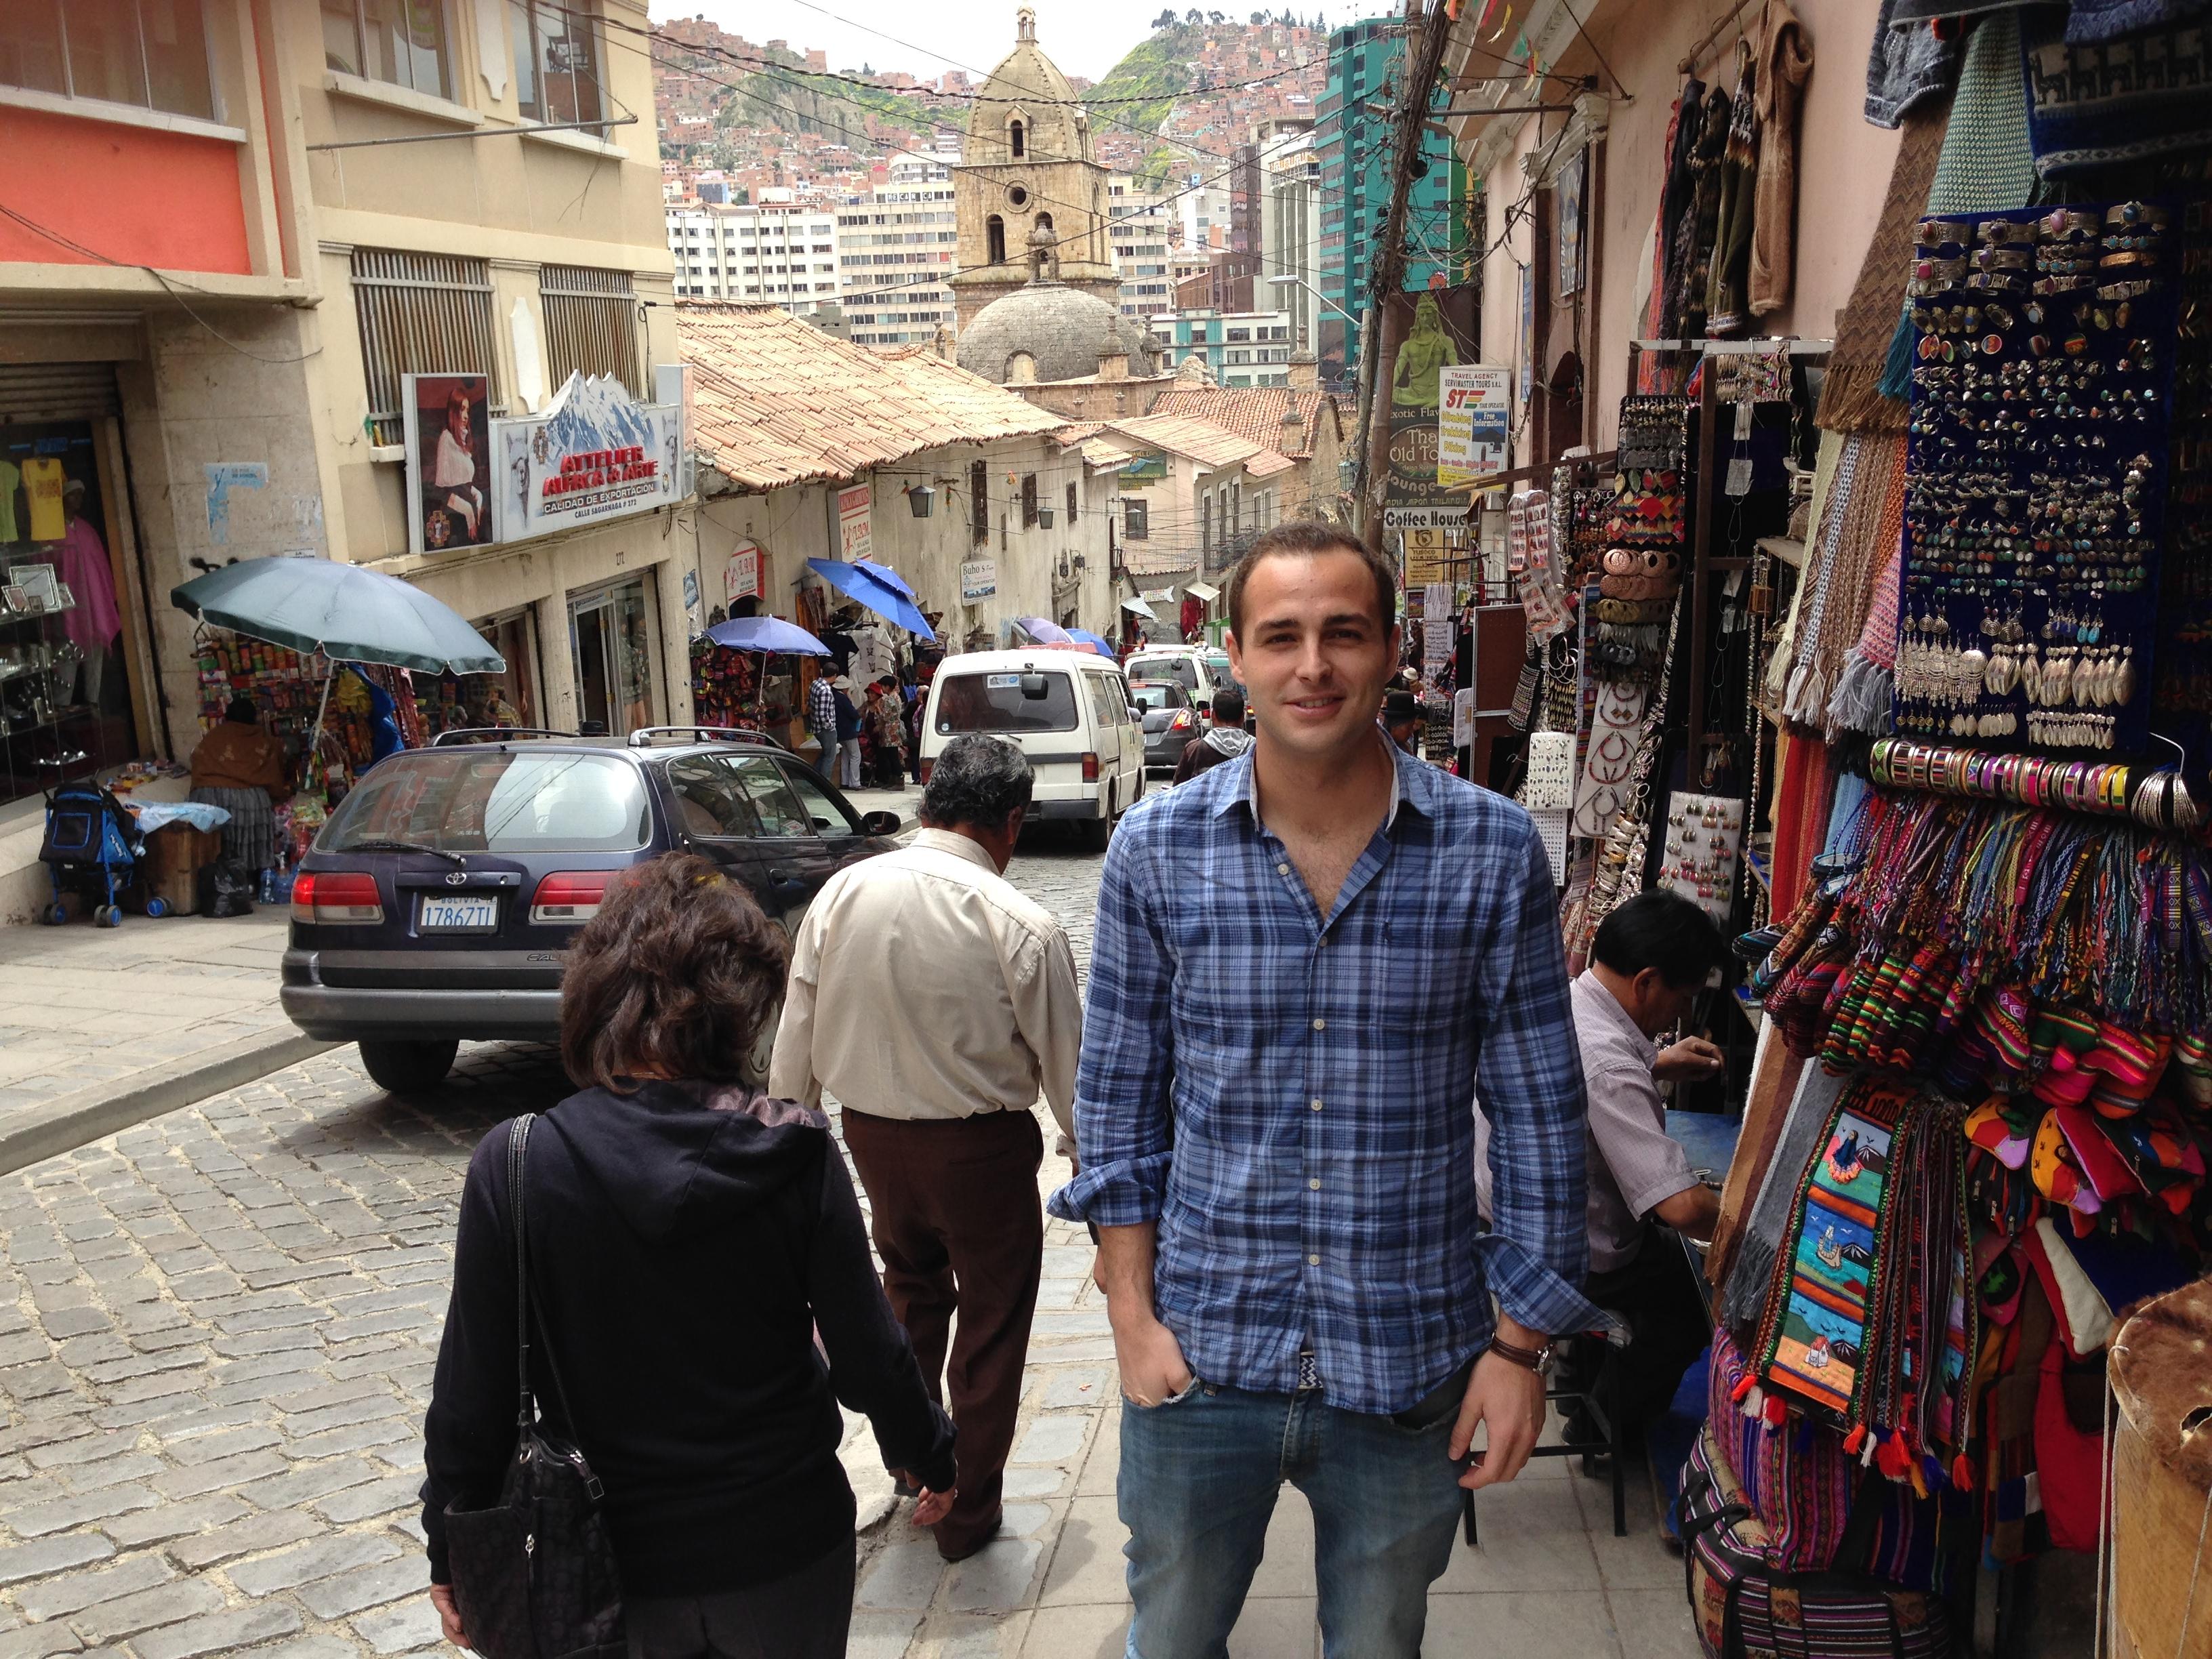 Calle típica de La Paz